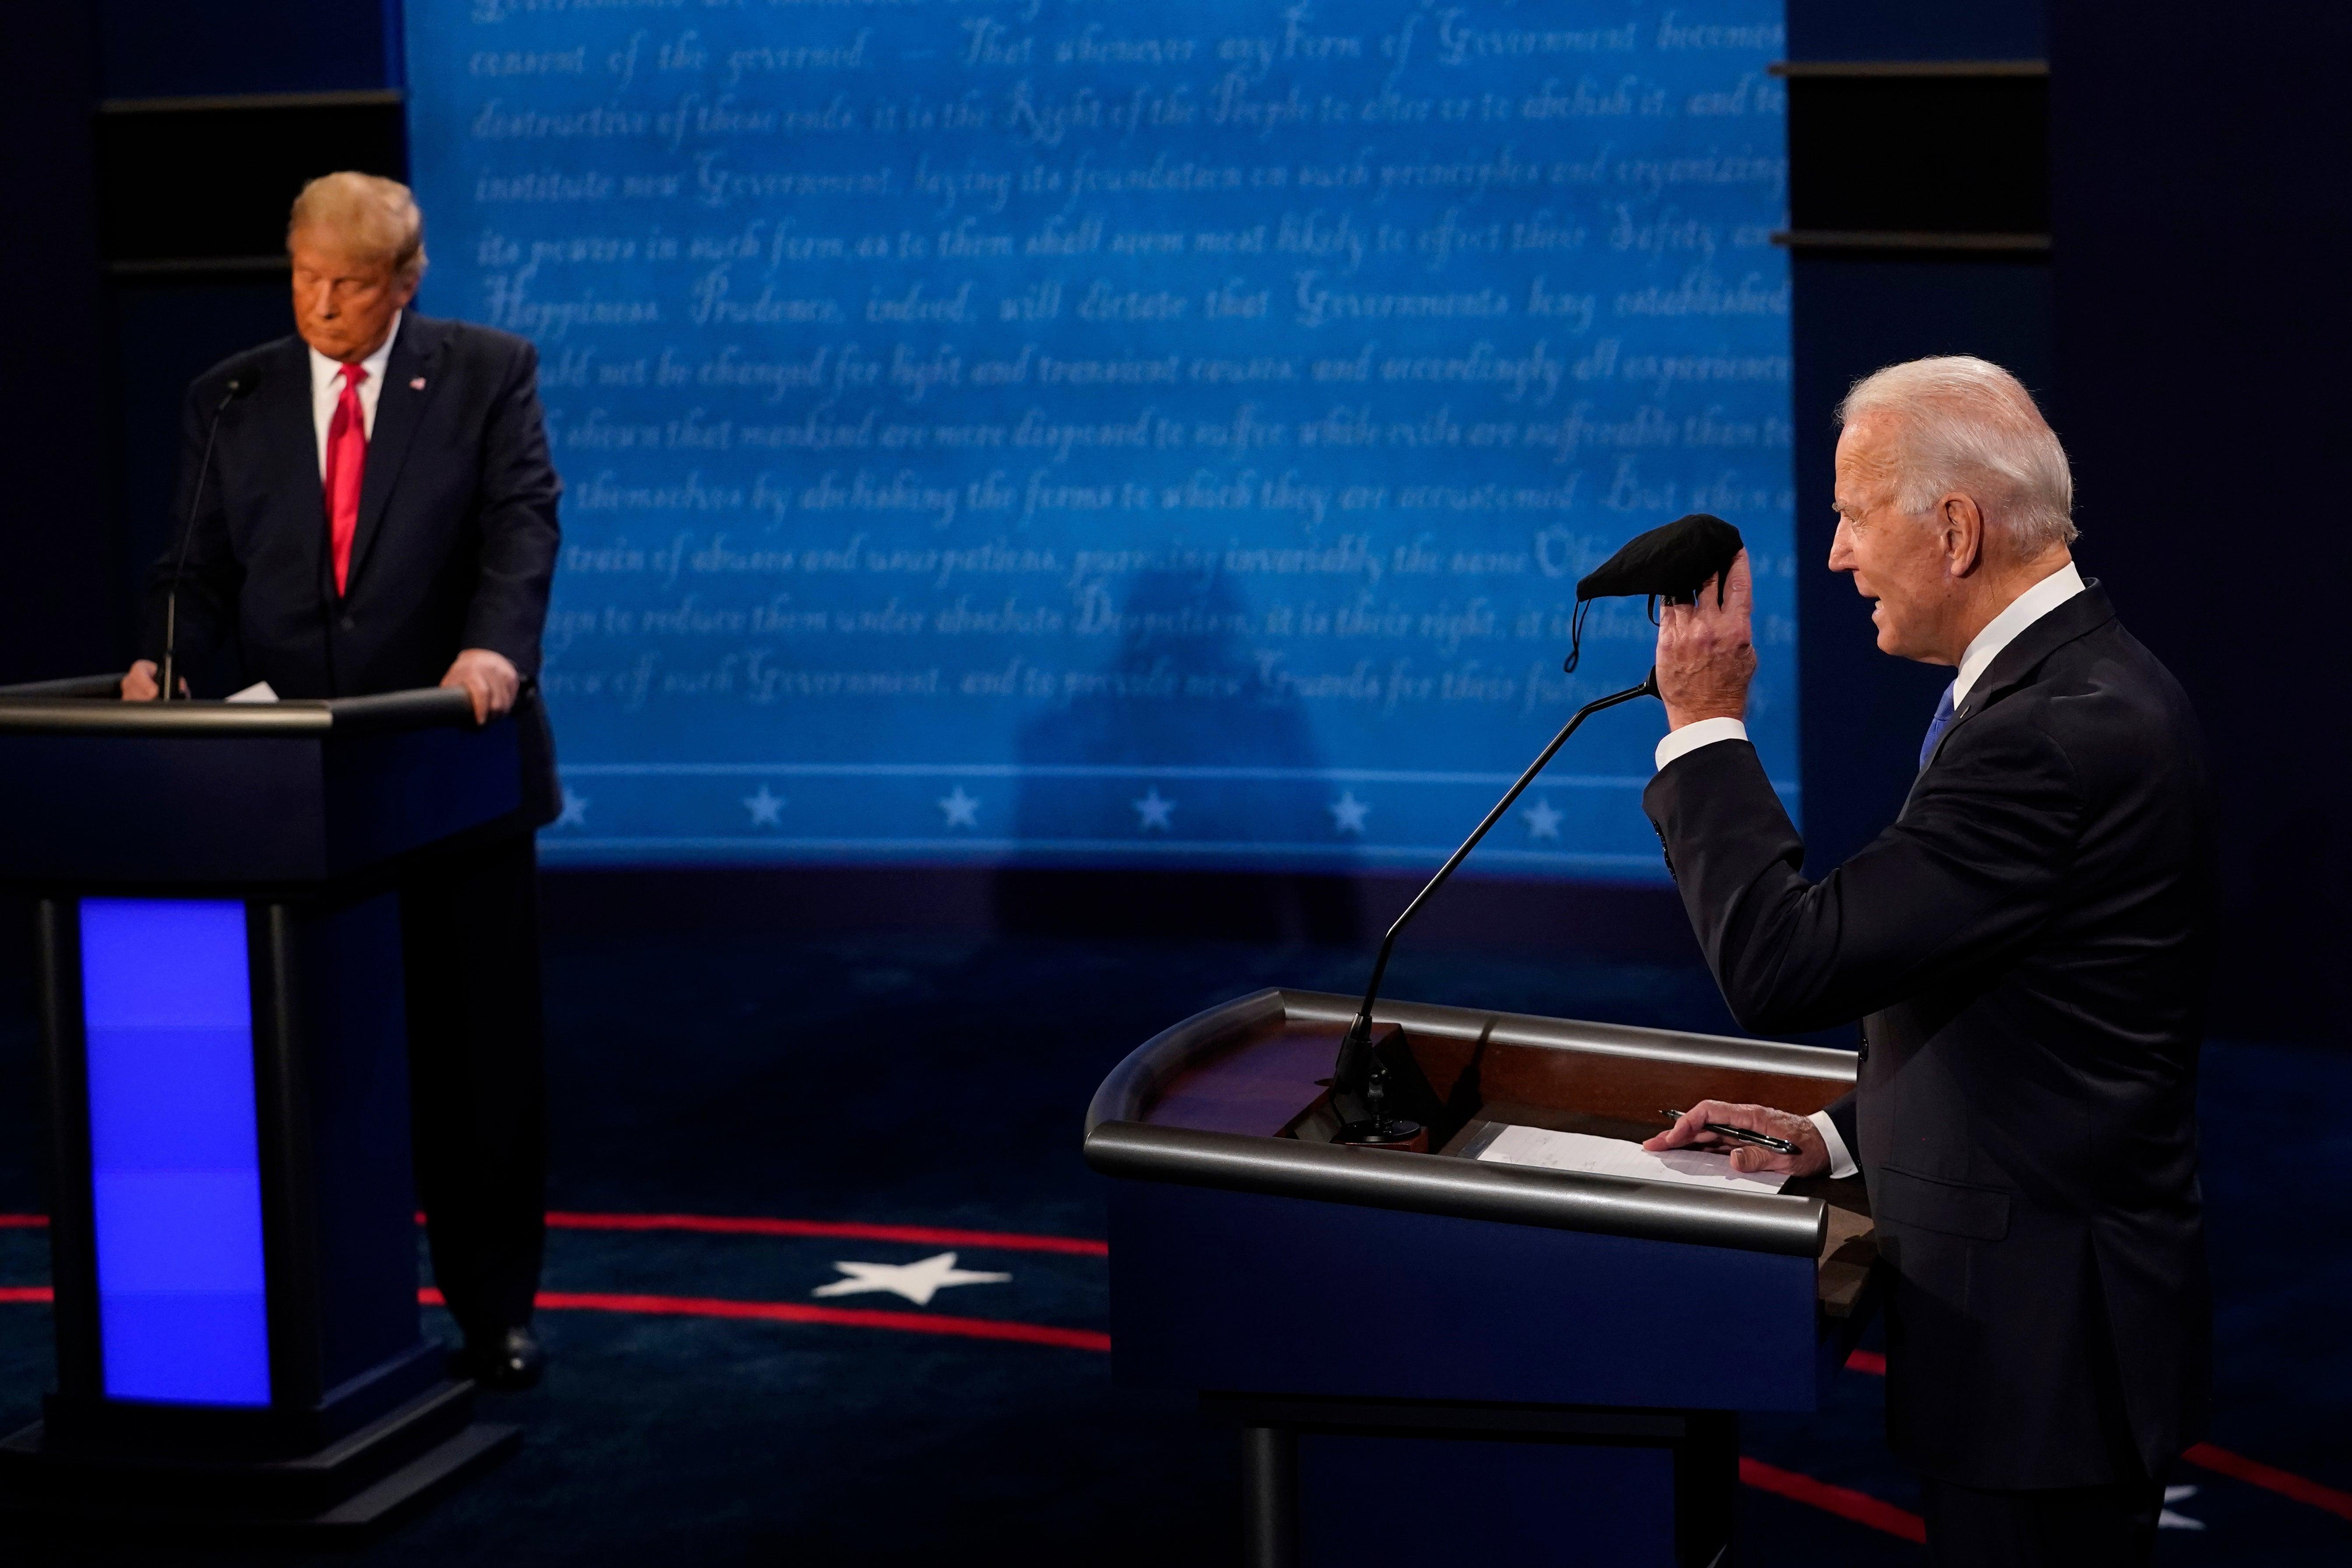 GOP pounces on Biden's debate pledge to 'transition' away oil industry